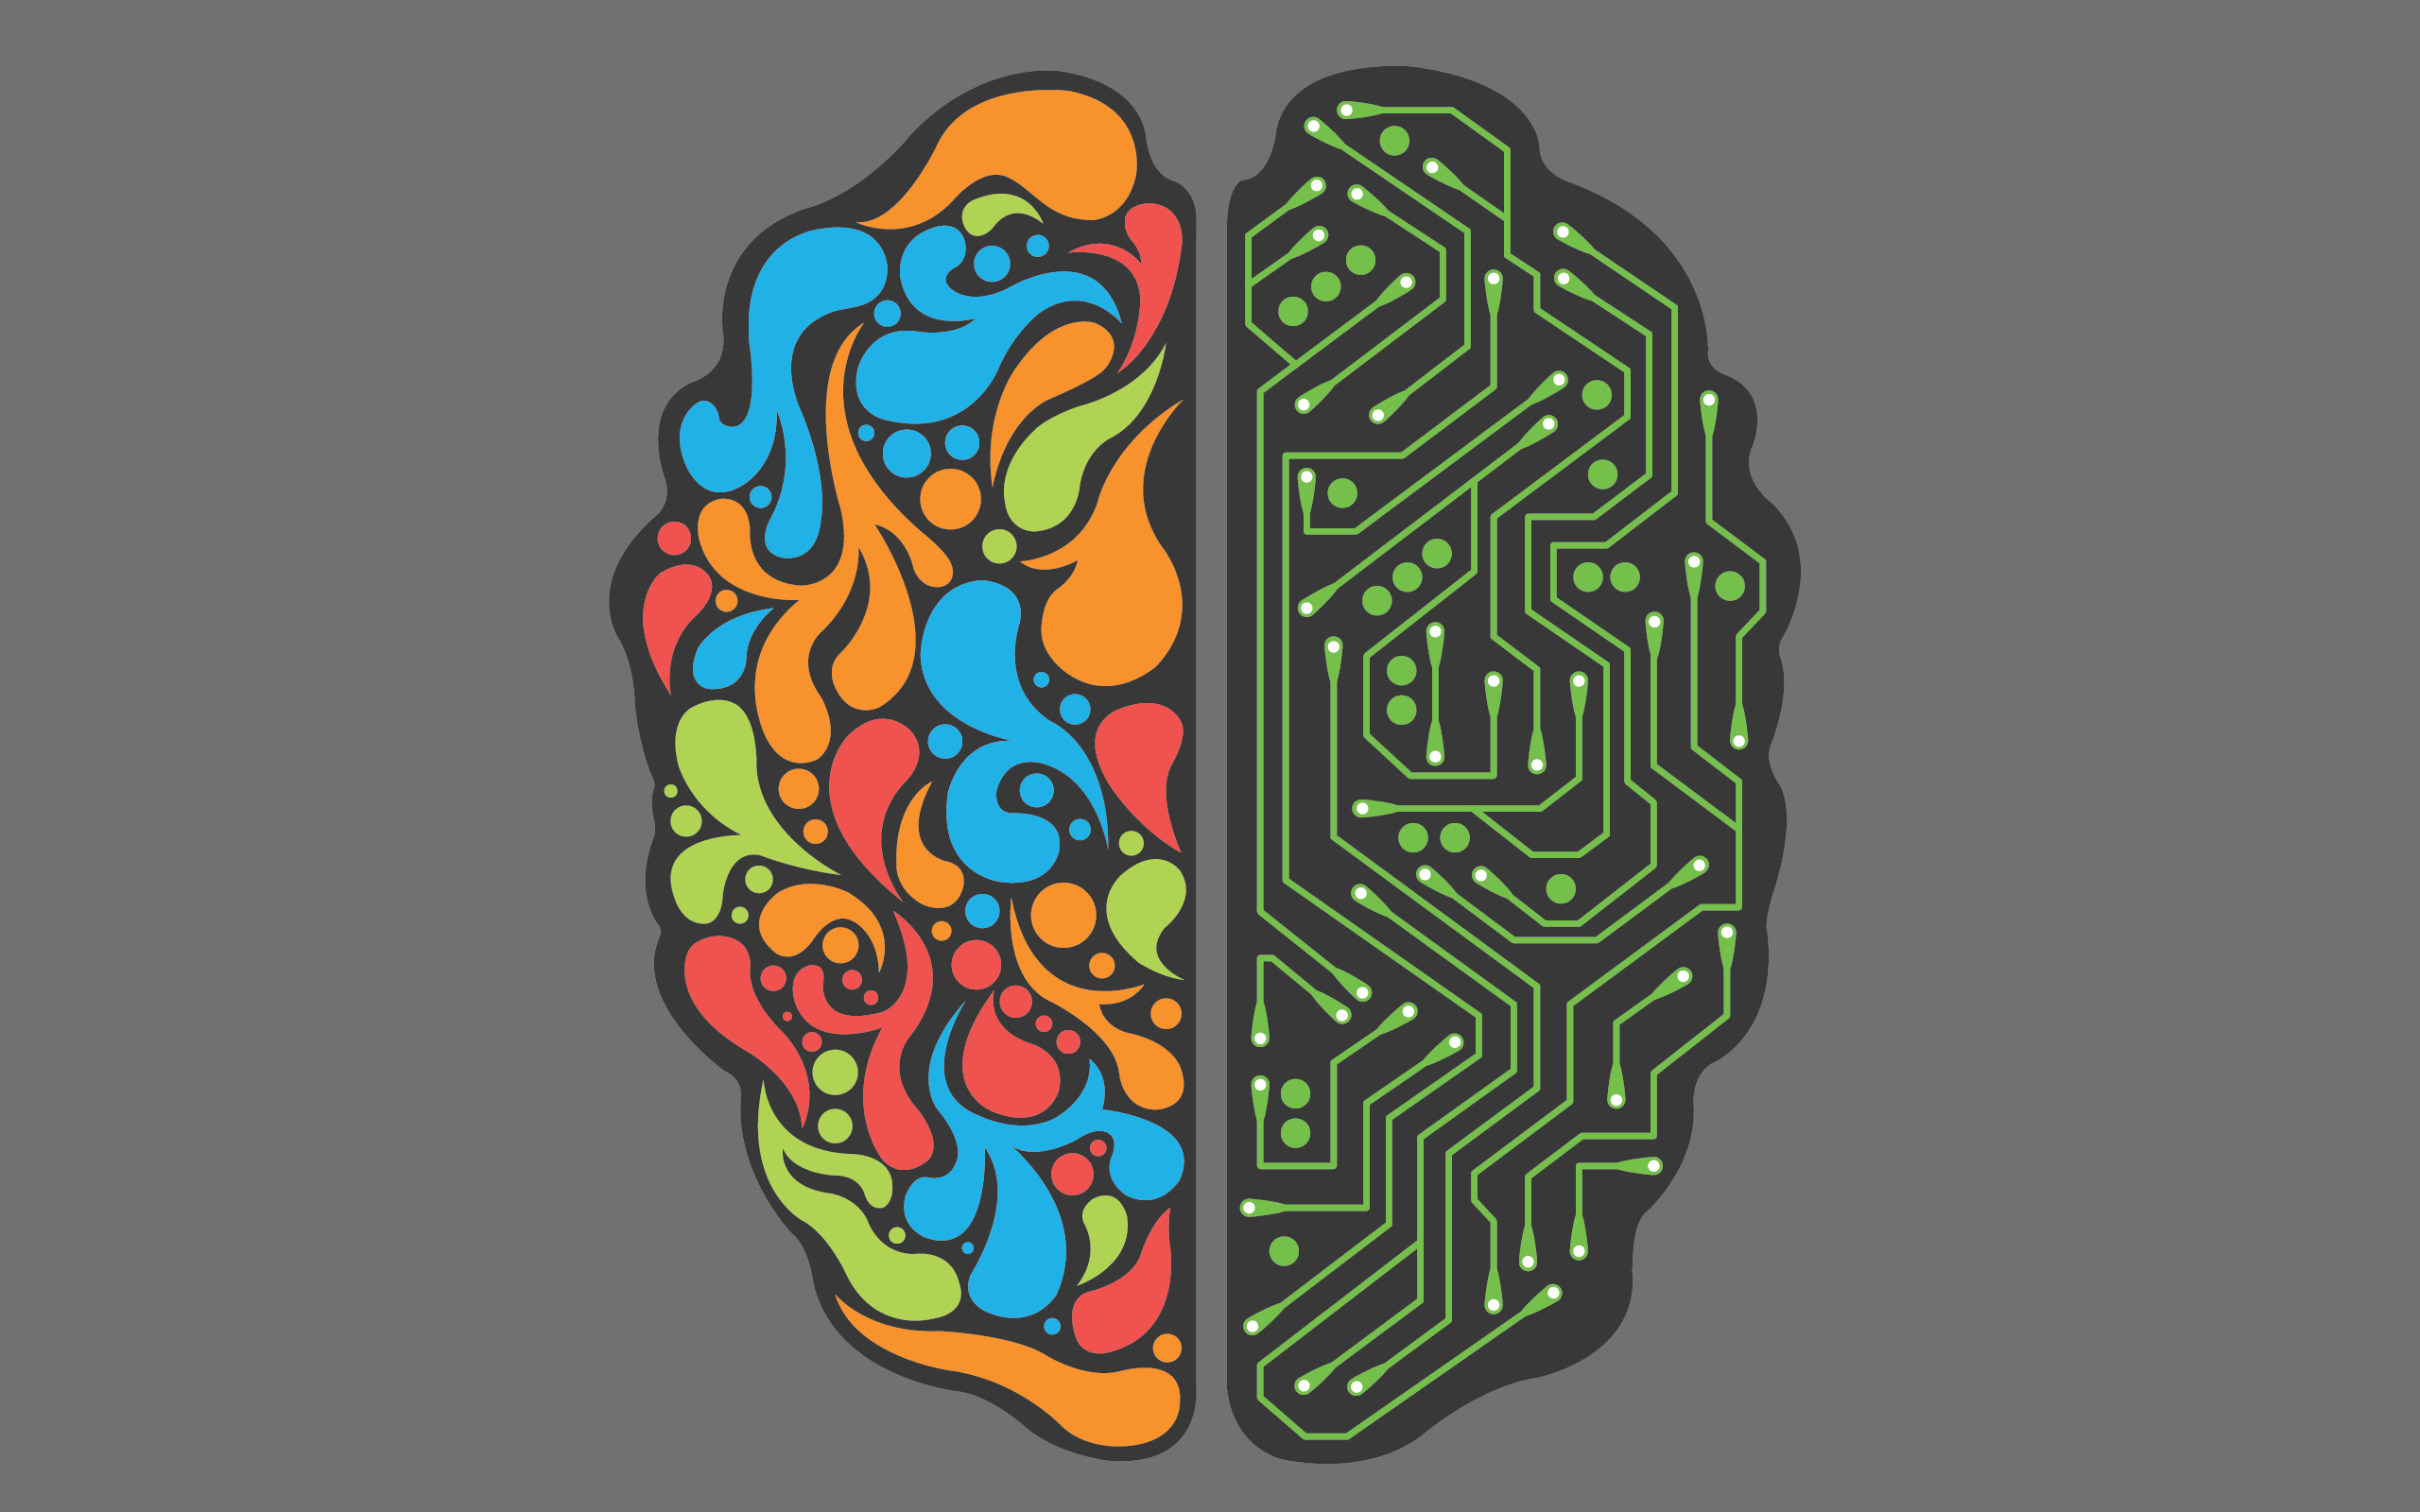 Brain HD PNG - 96370